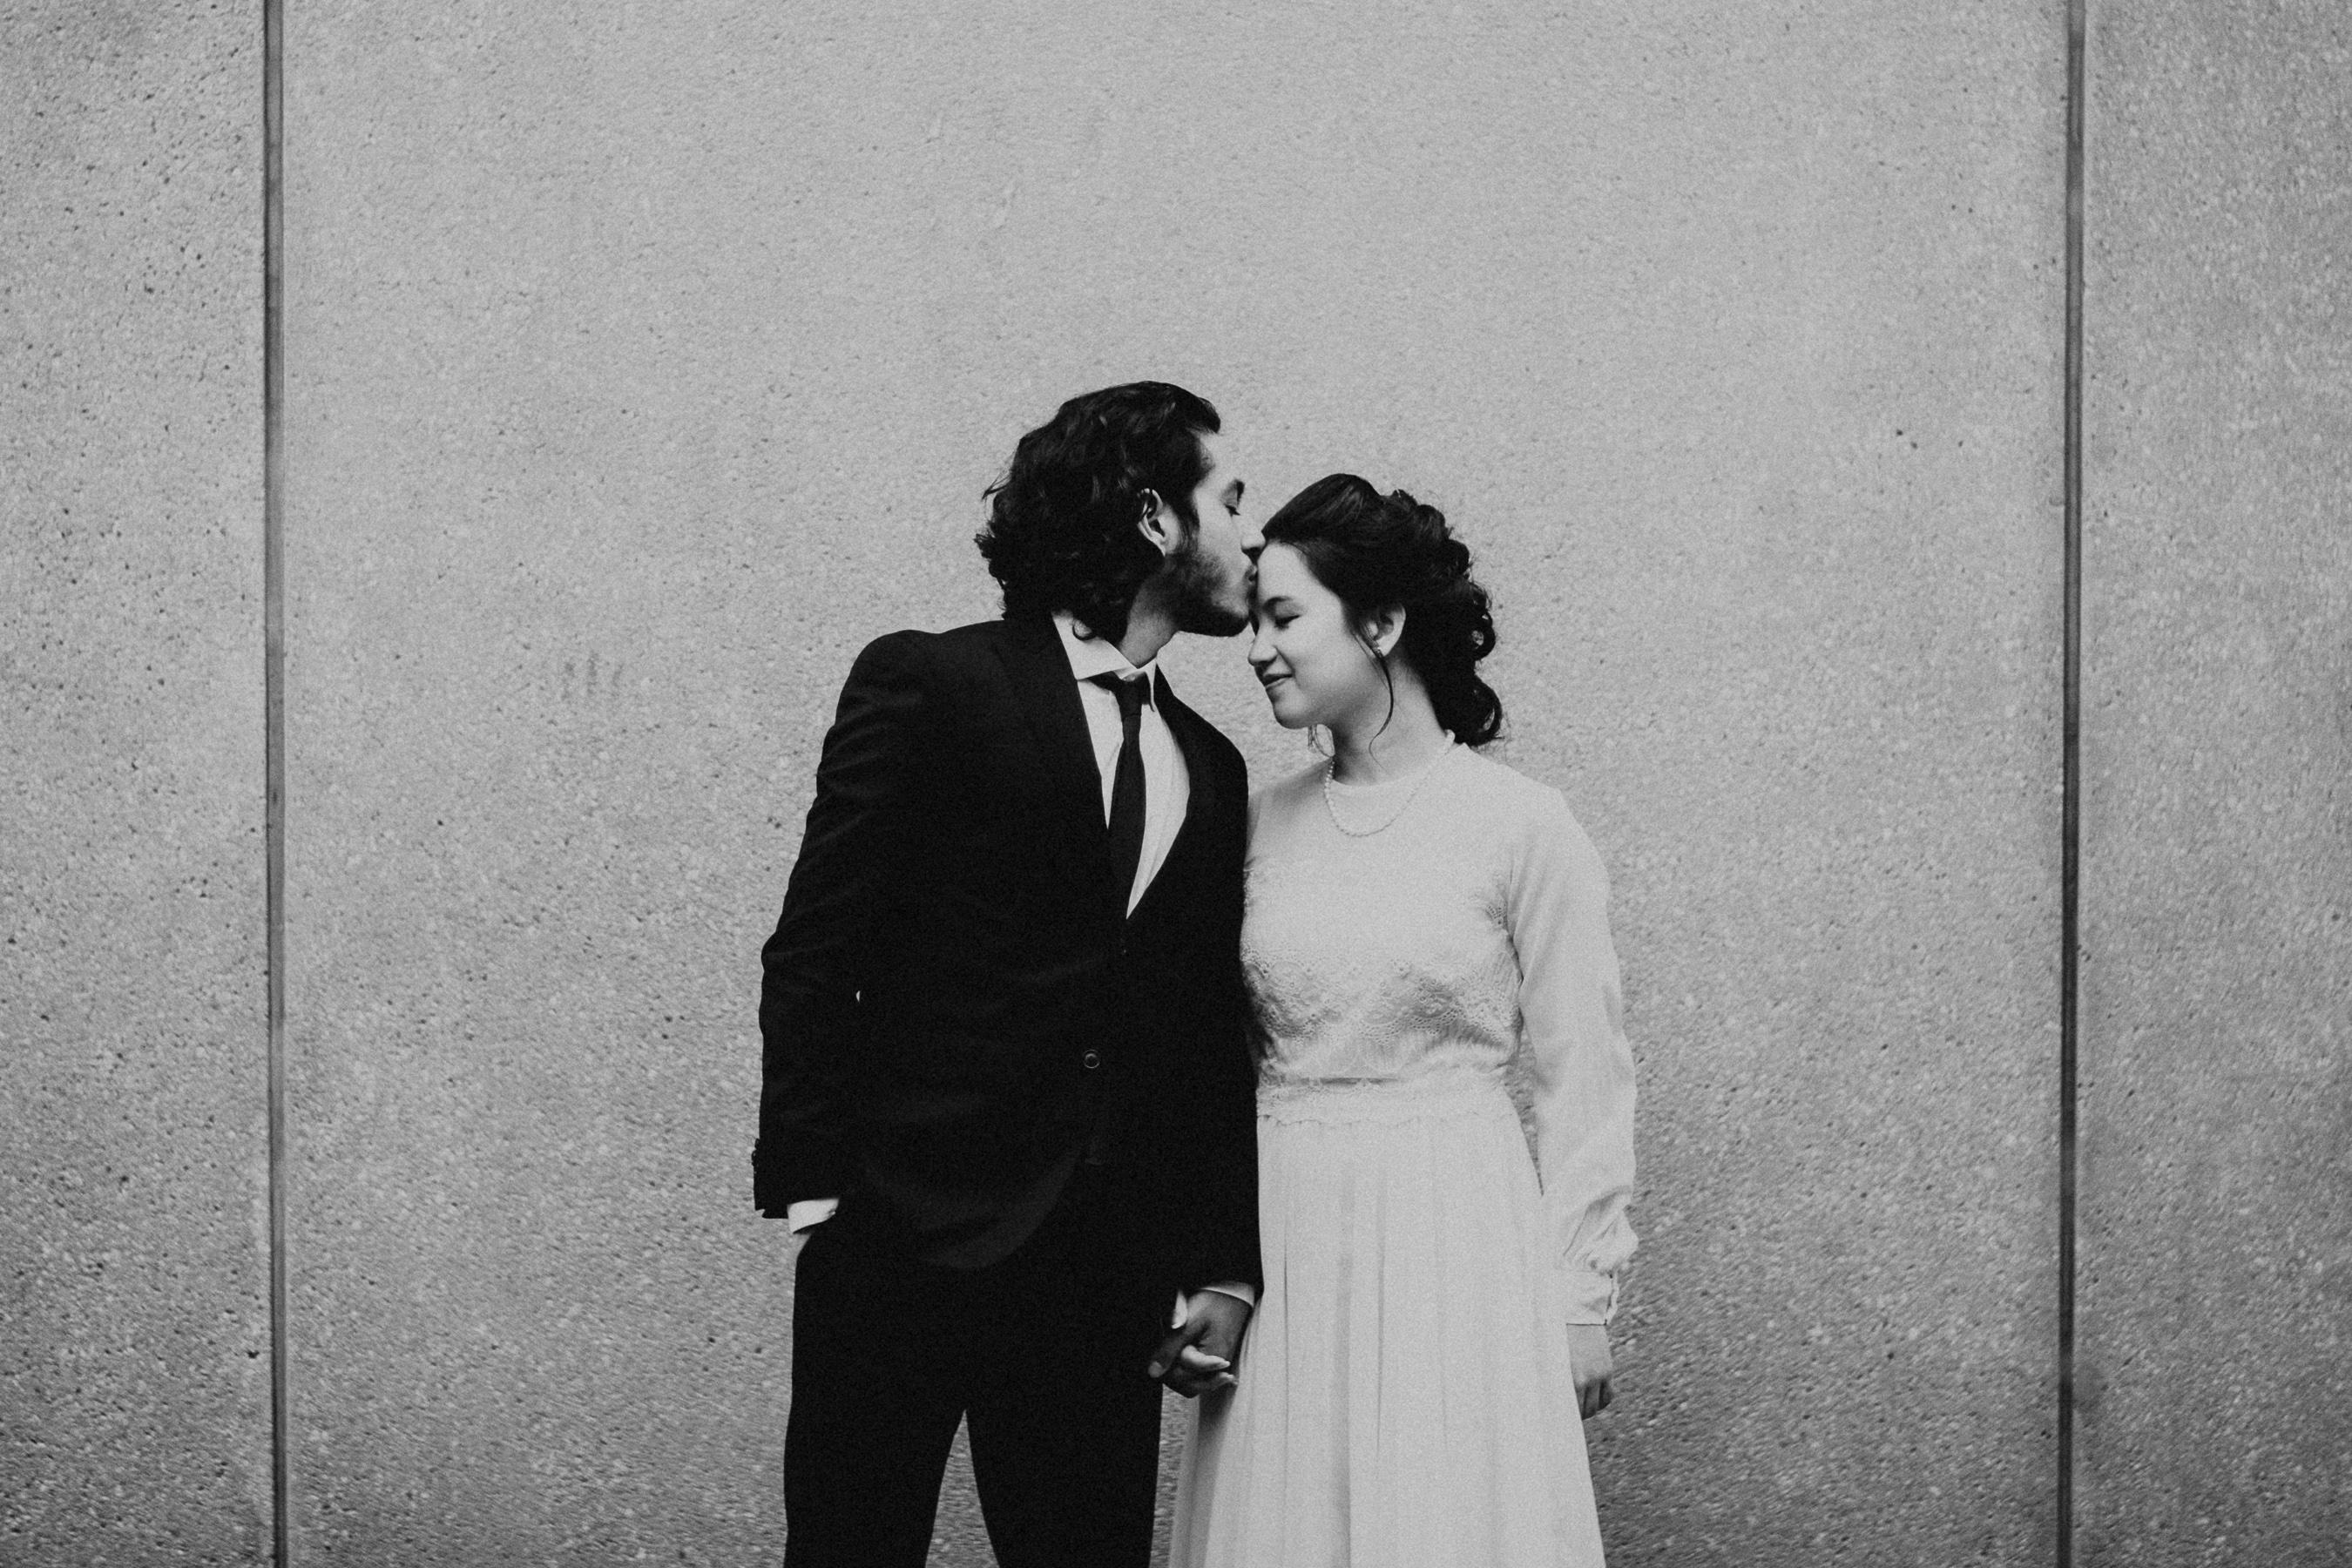 U of T Campus Wedding Photoshoot | Toronto 1 Avangard Photography Toronto Wedding Photographer